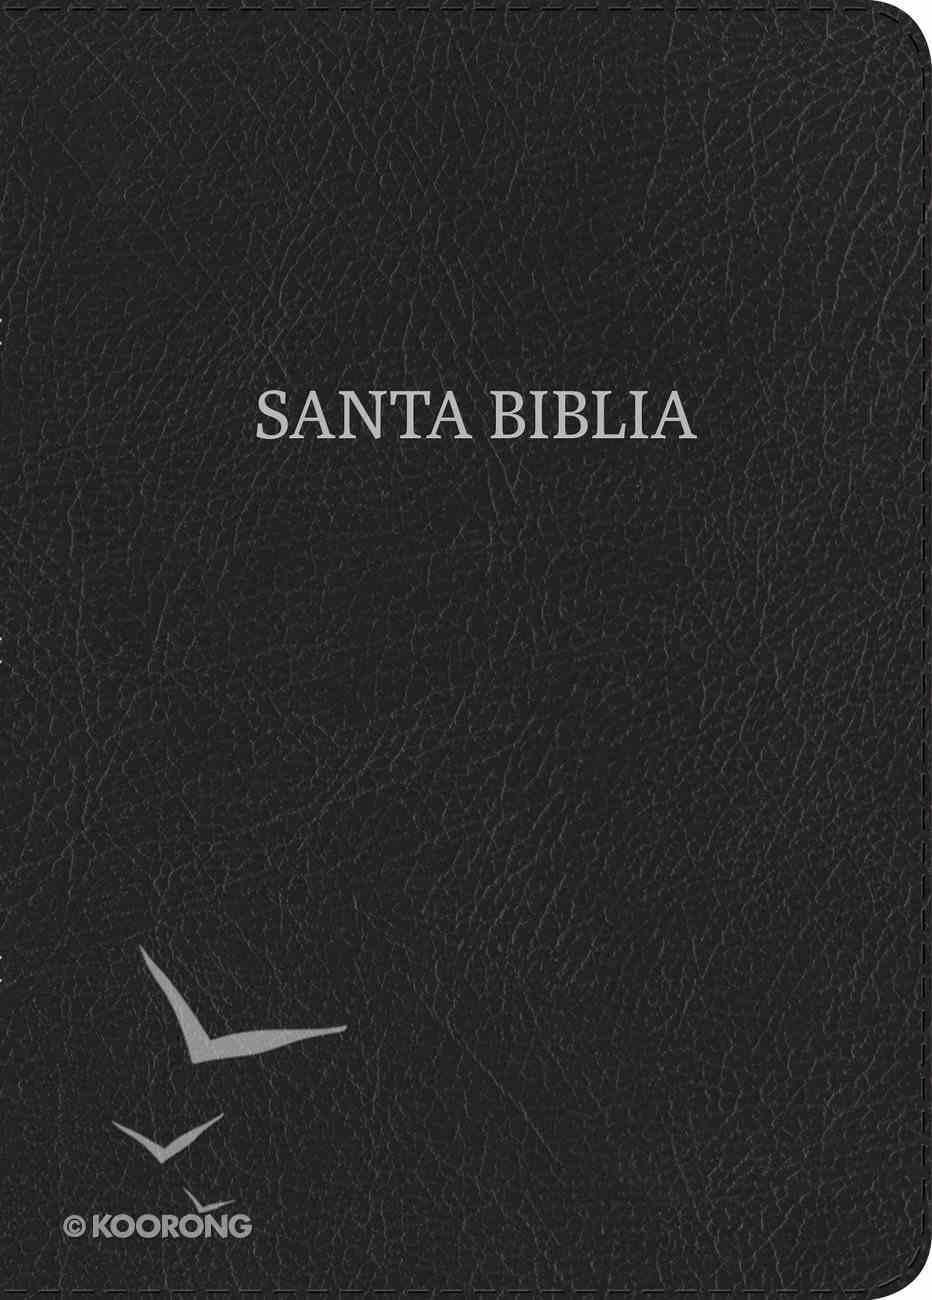 Nvi Biblia Compacta Letra Grande Negro (Large Print Compact) Bonded Leather